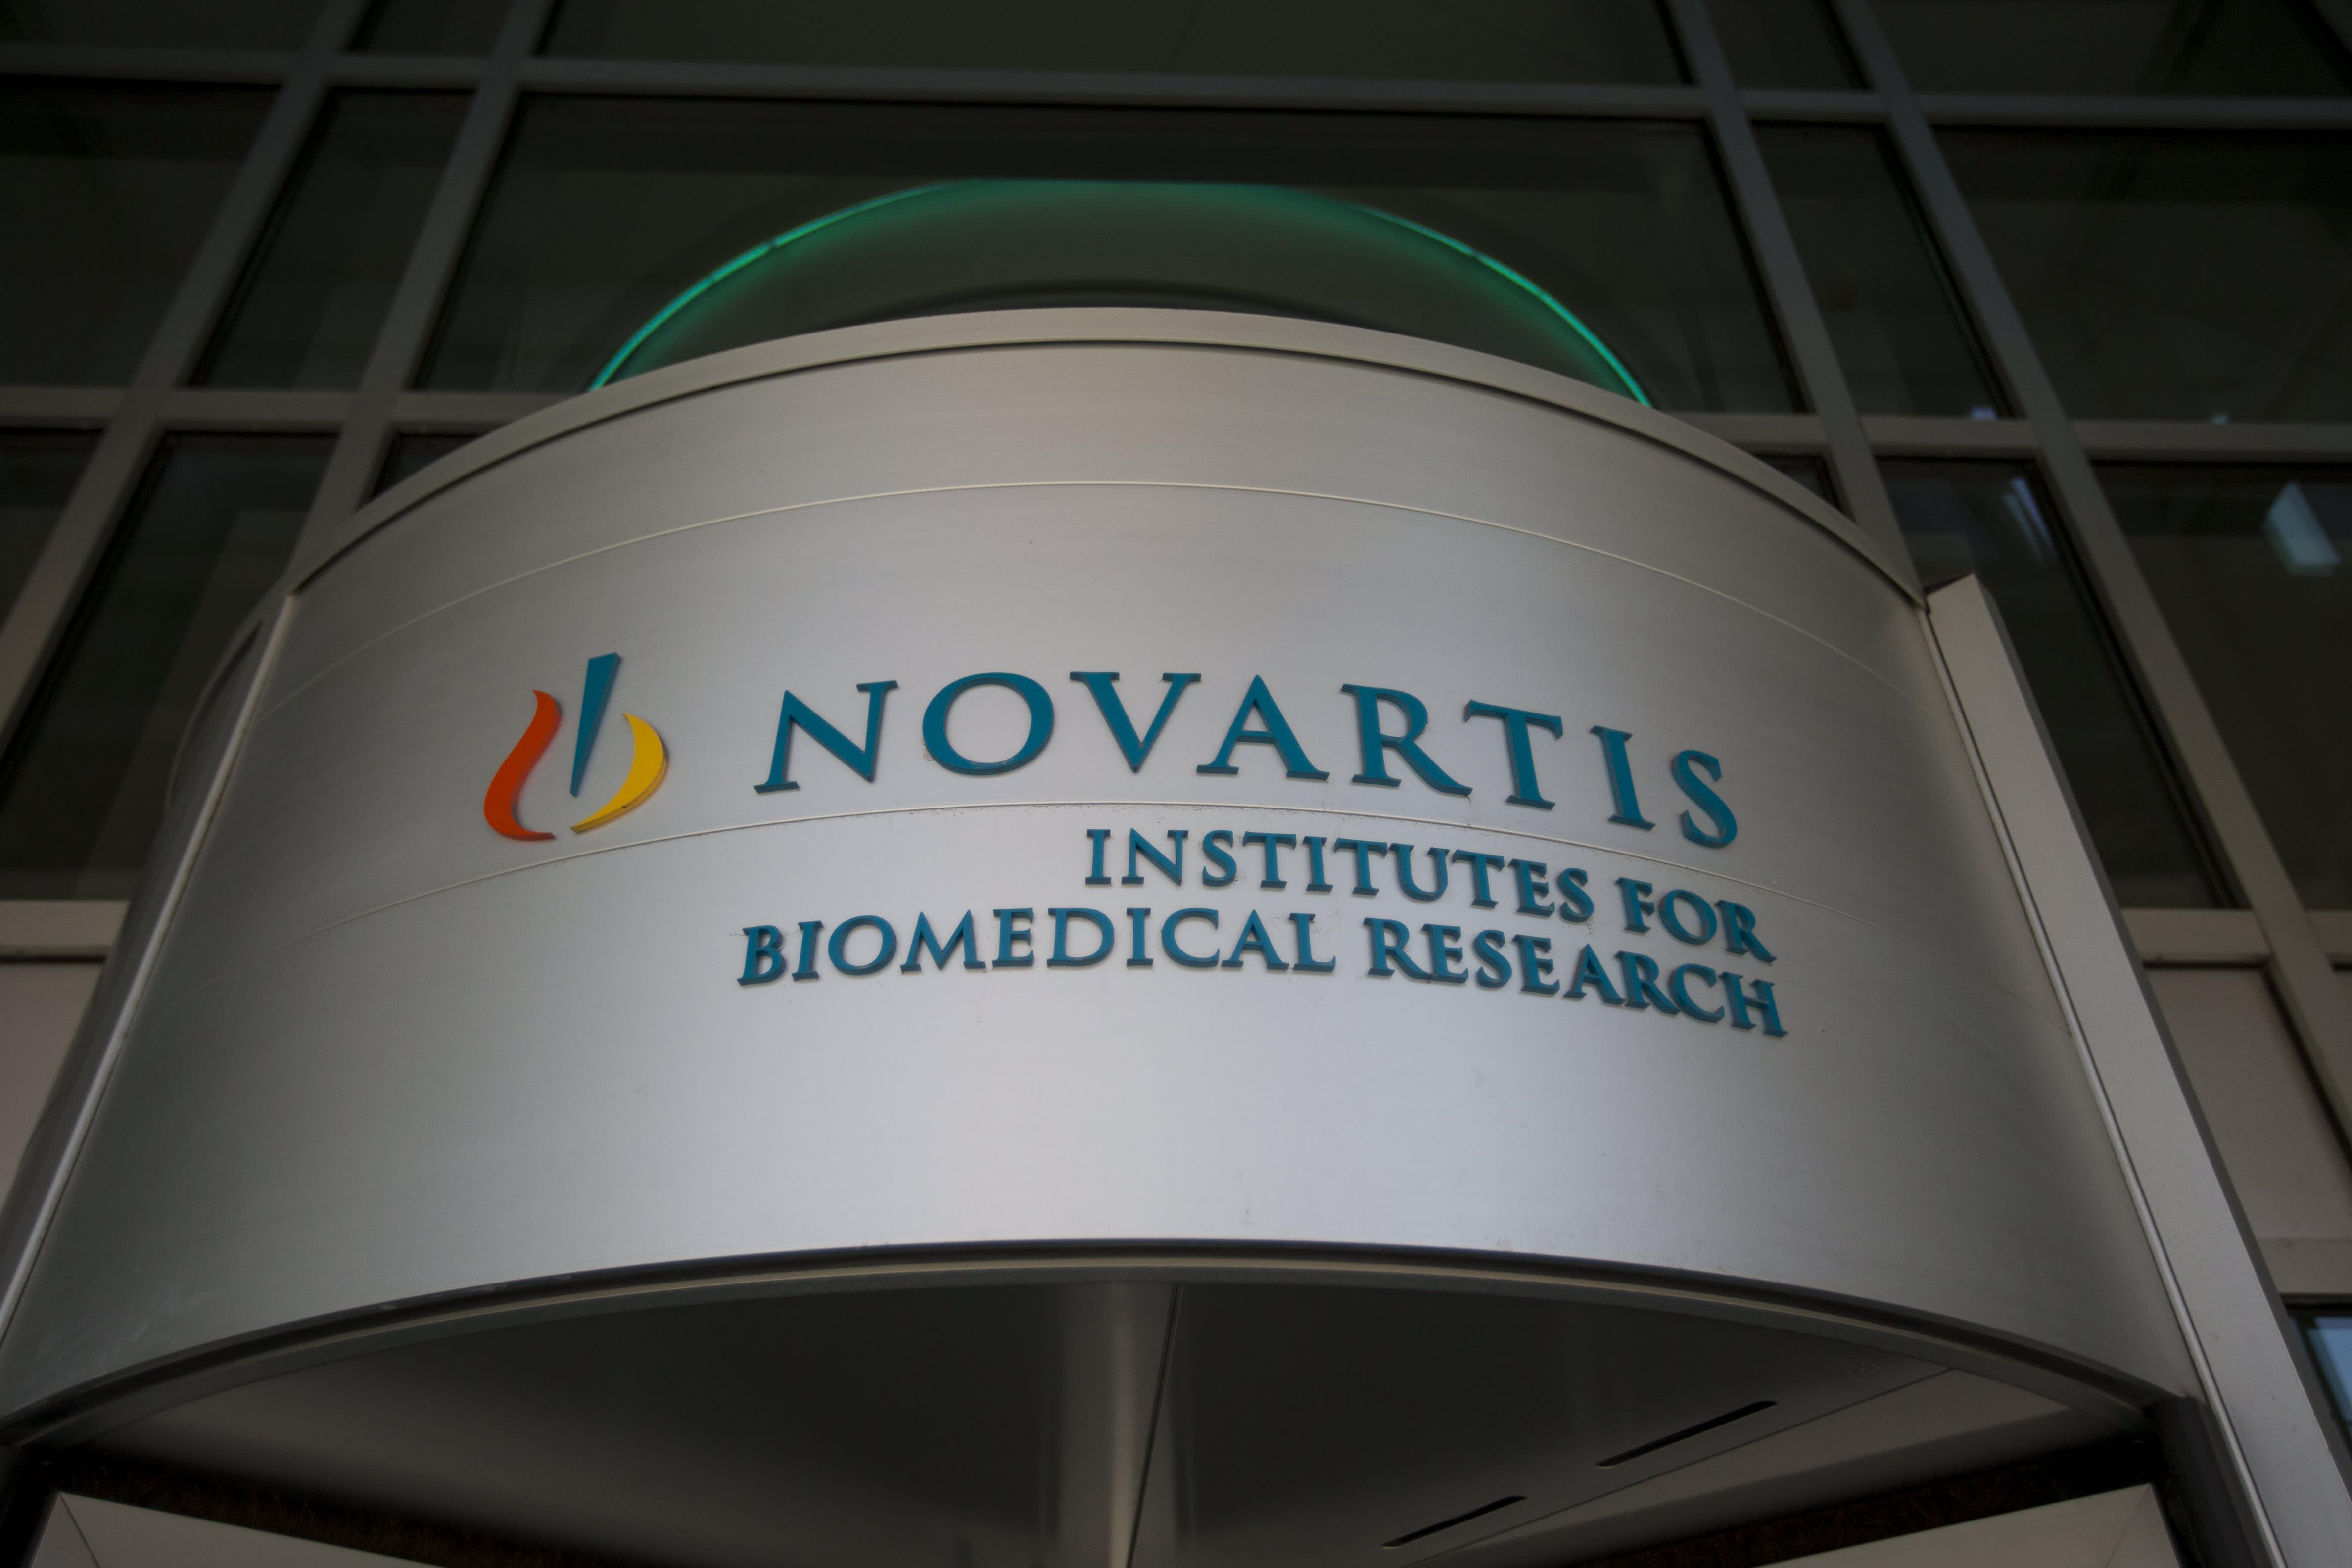 Novartis raises 2019 guidance, helped by Sandoz generics unit